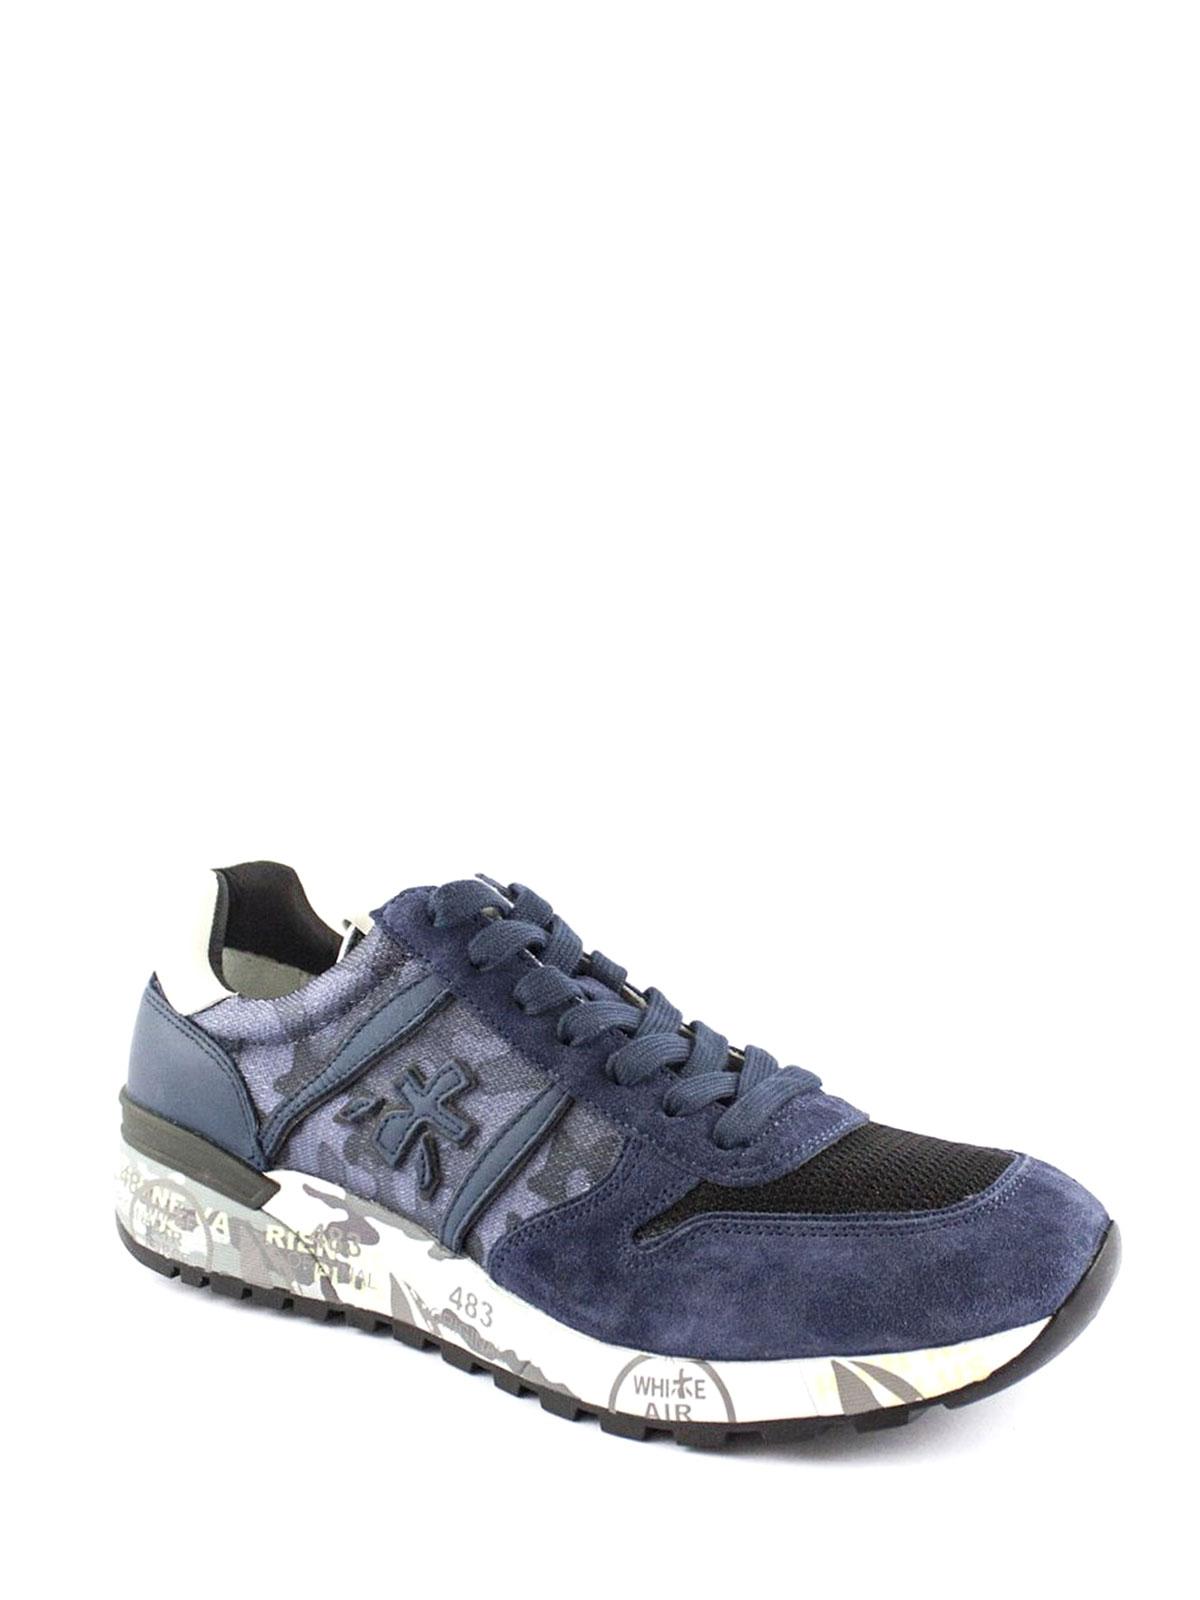 Lander2351Ikrix Sneaker Shop Blau Online Premiata Y76vgfby